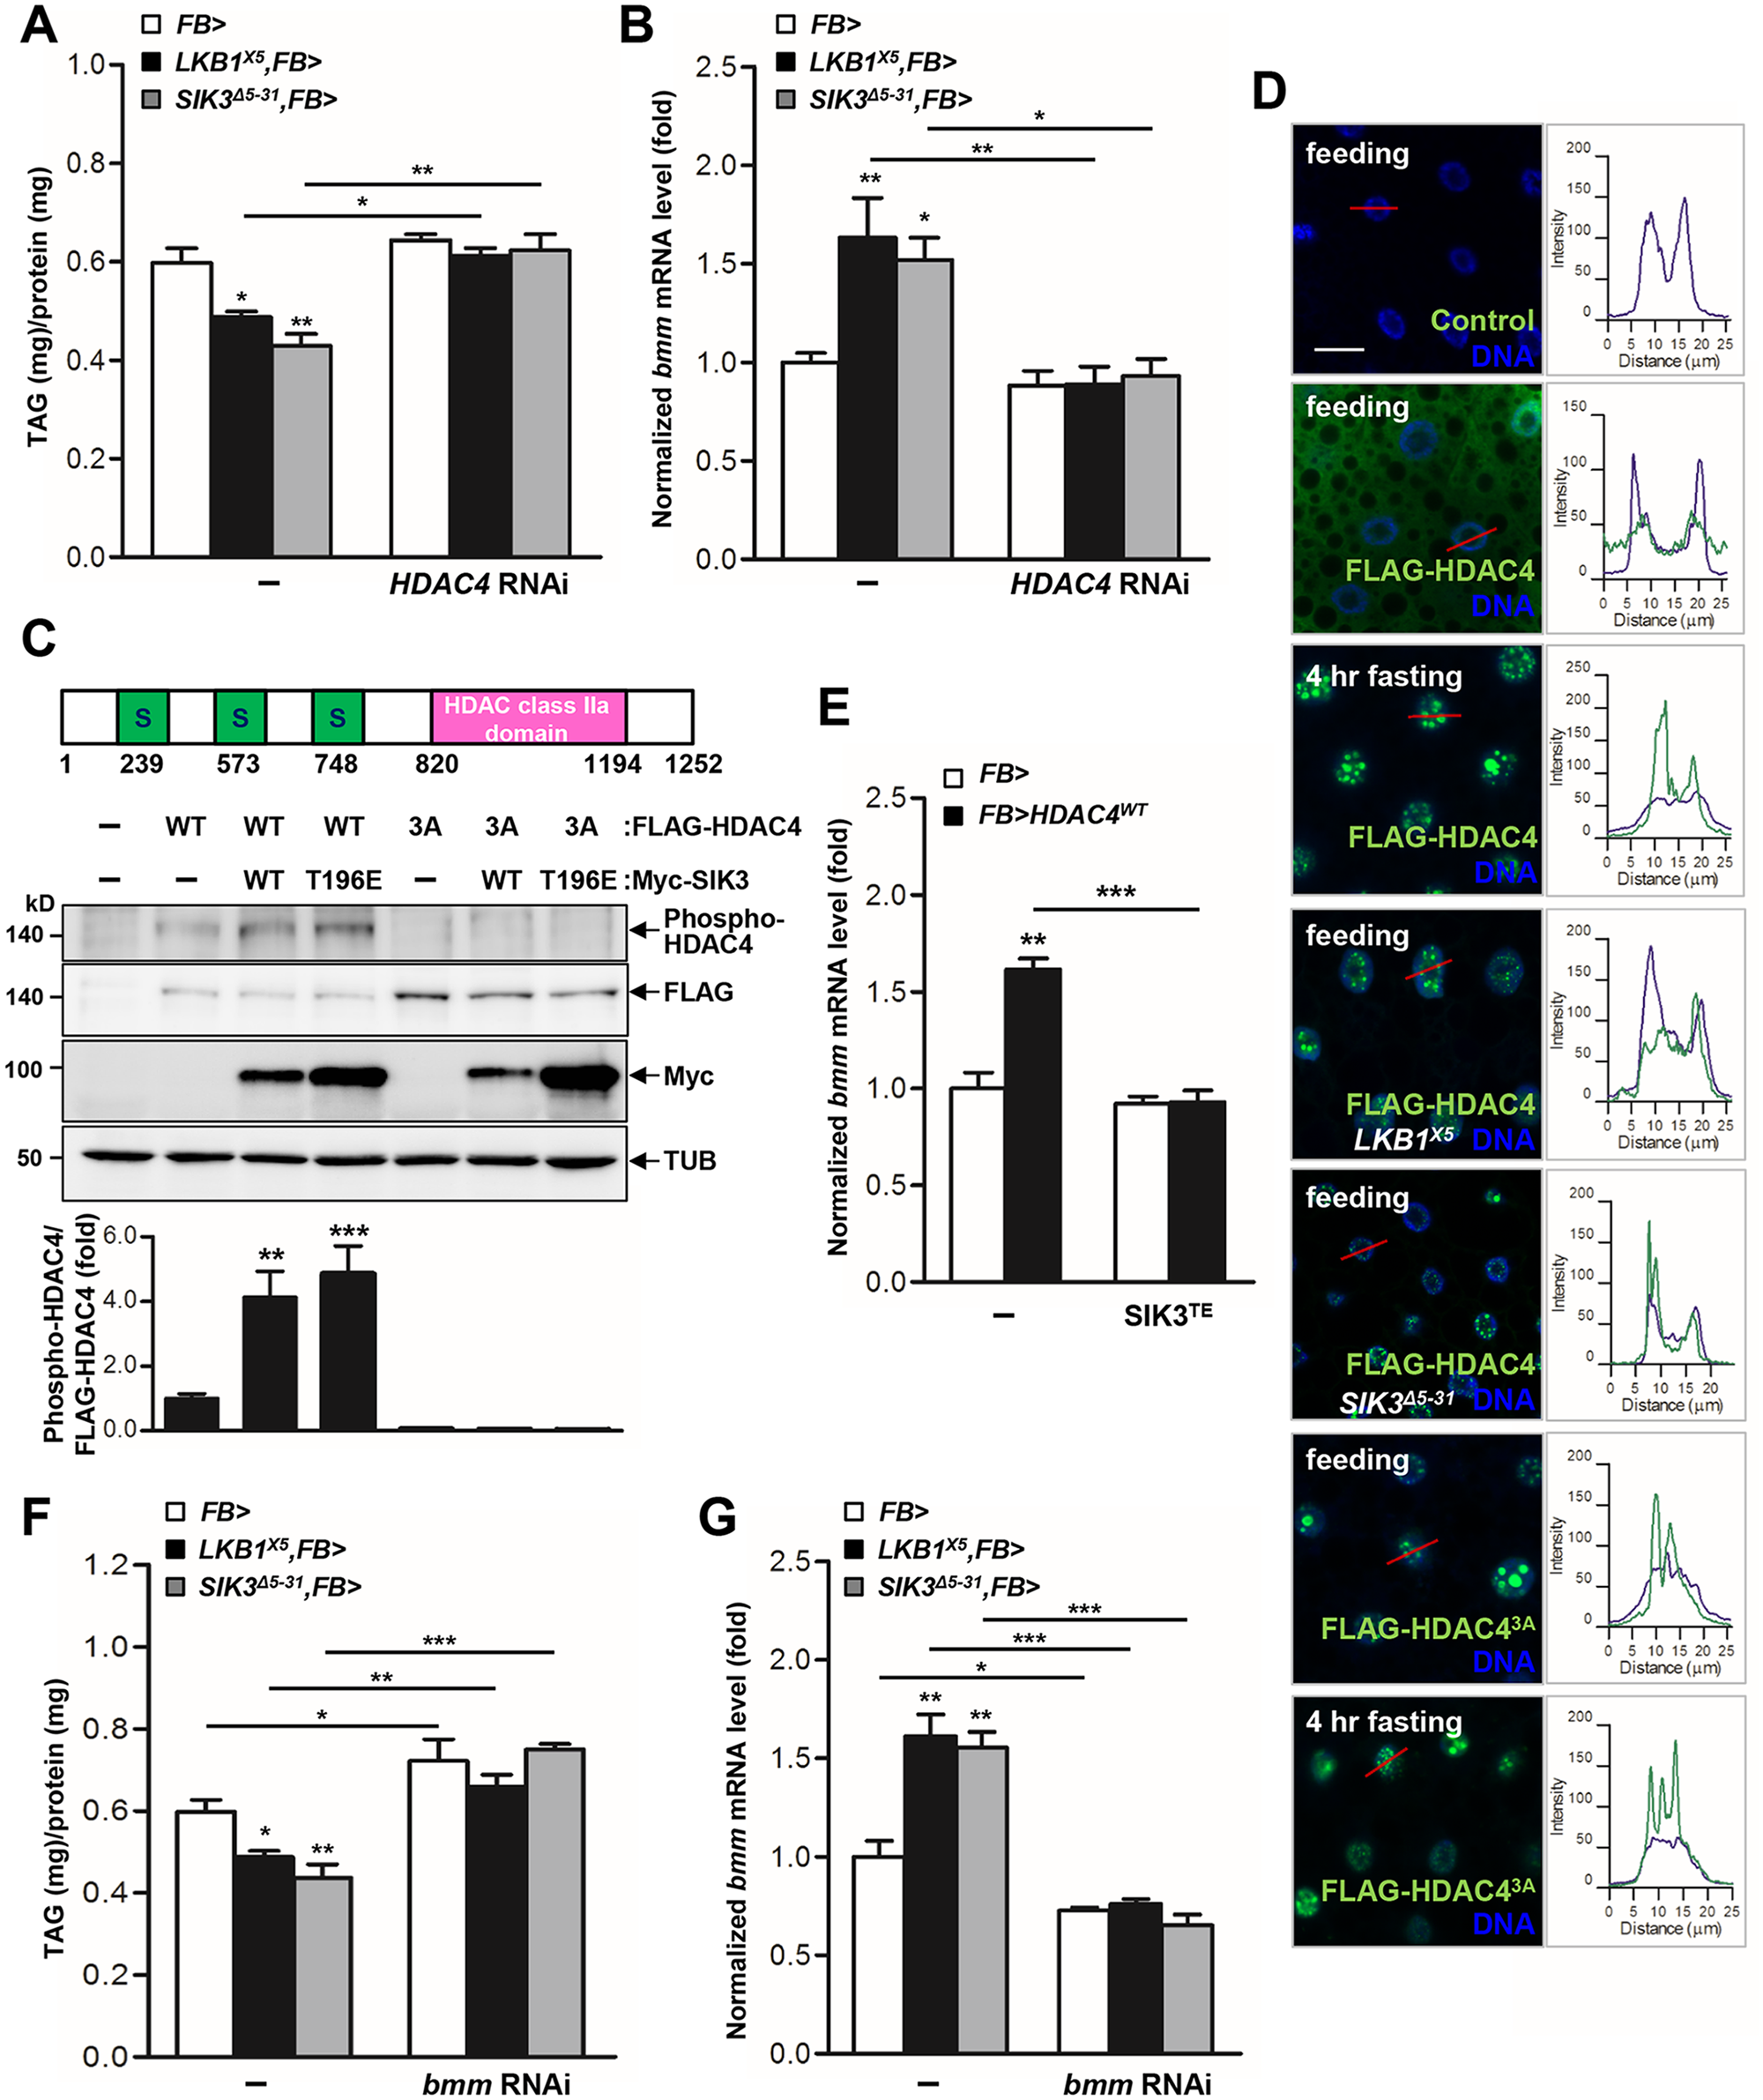 HDAC4 is the responsible target of LKB1-SIK3 signaling for controlling lipid homeostasis.